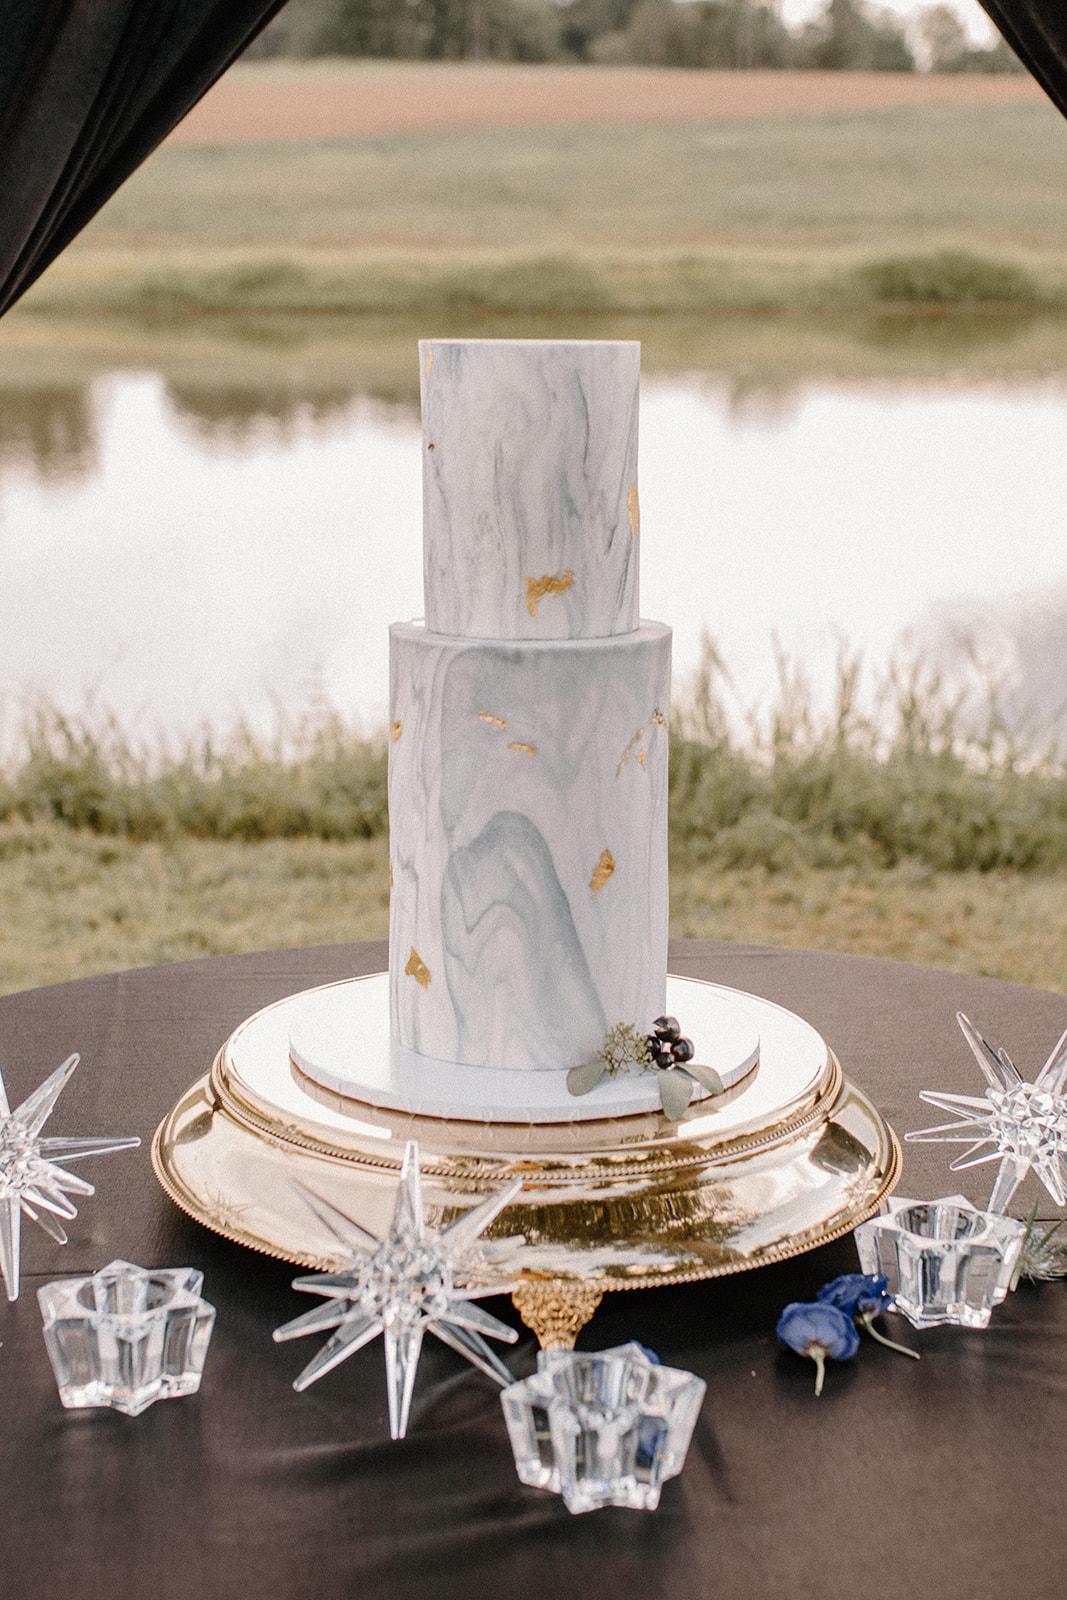 Celestial wedding cake design